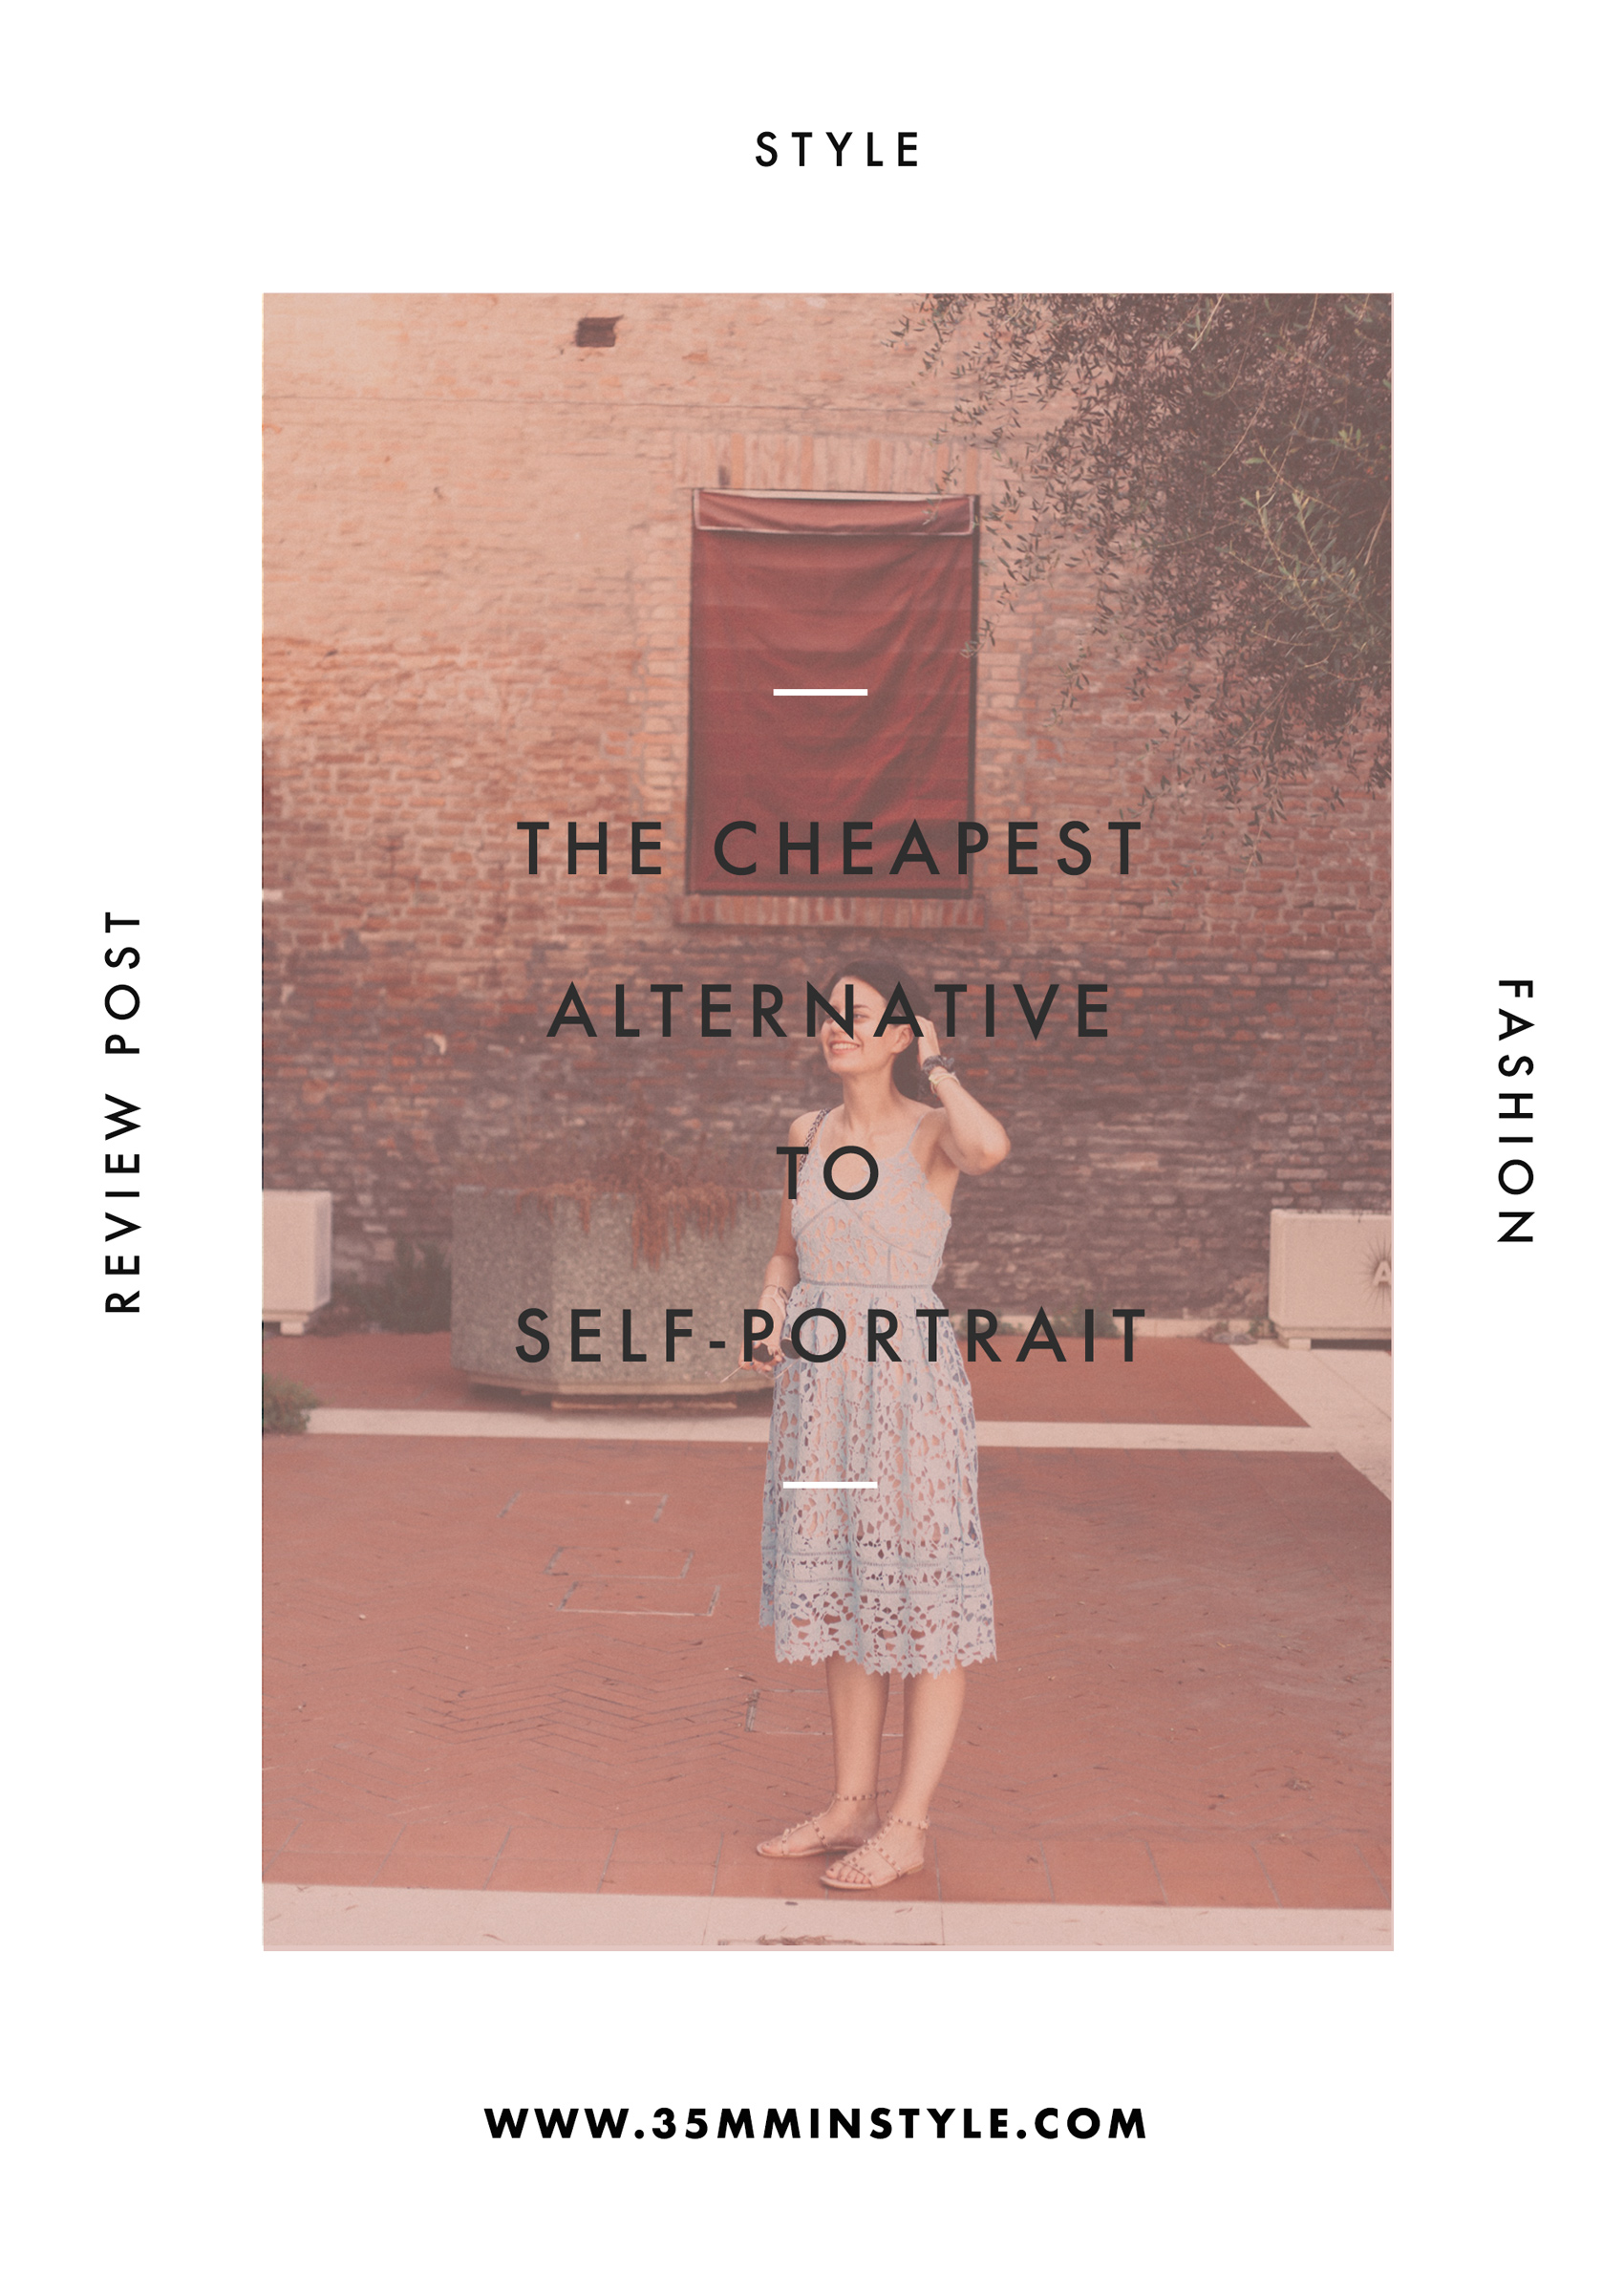 The Cheapest Alternative to Self-Portrait